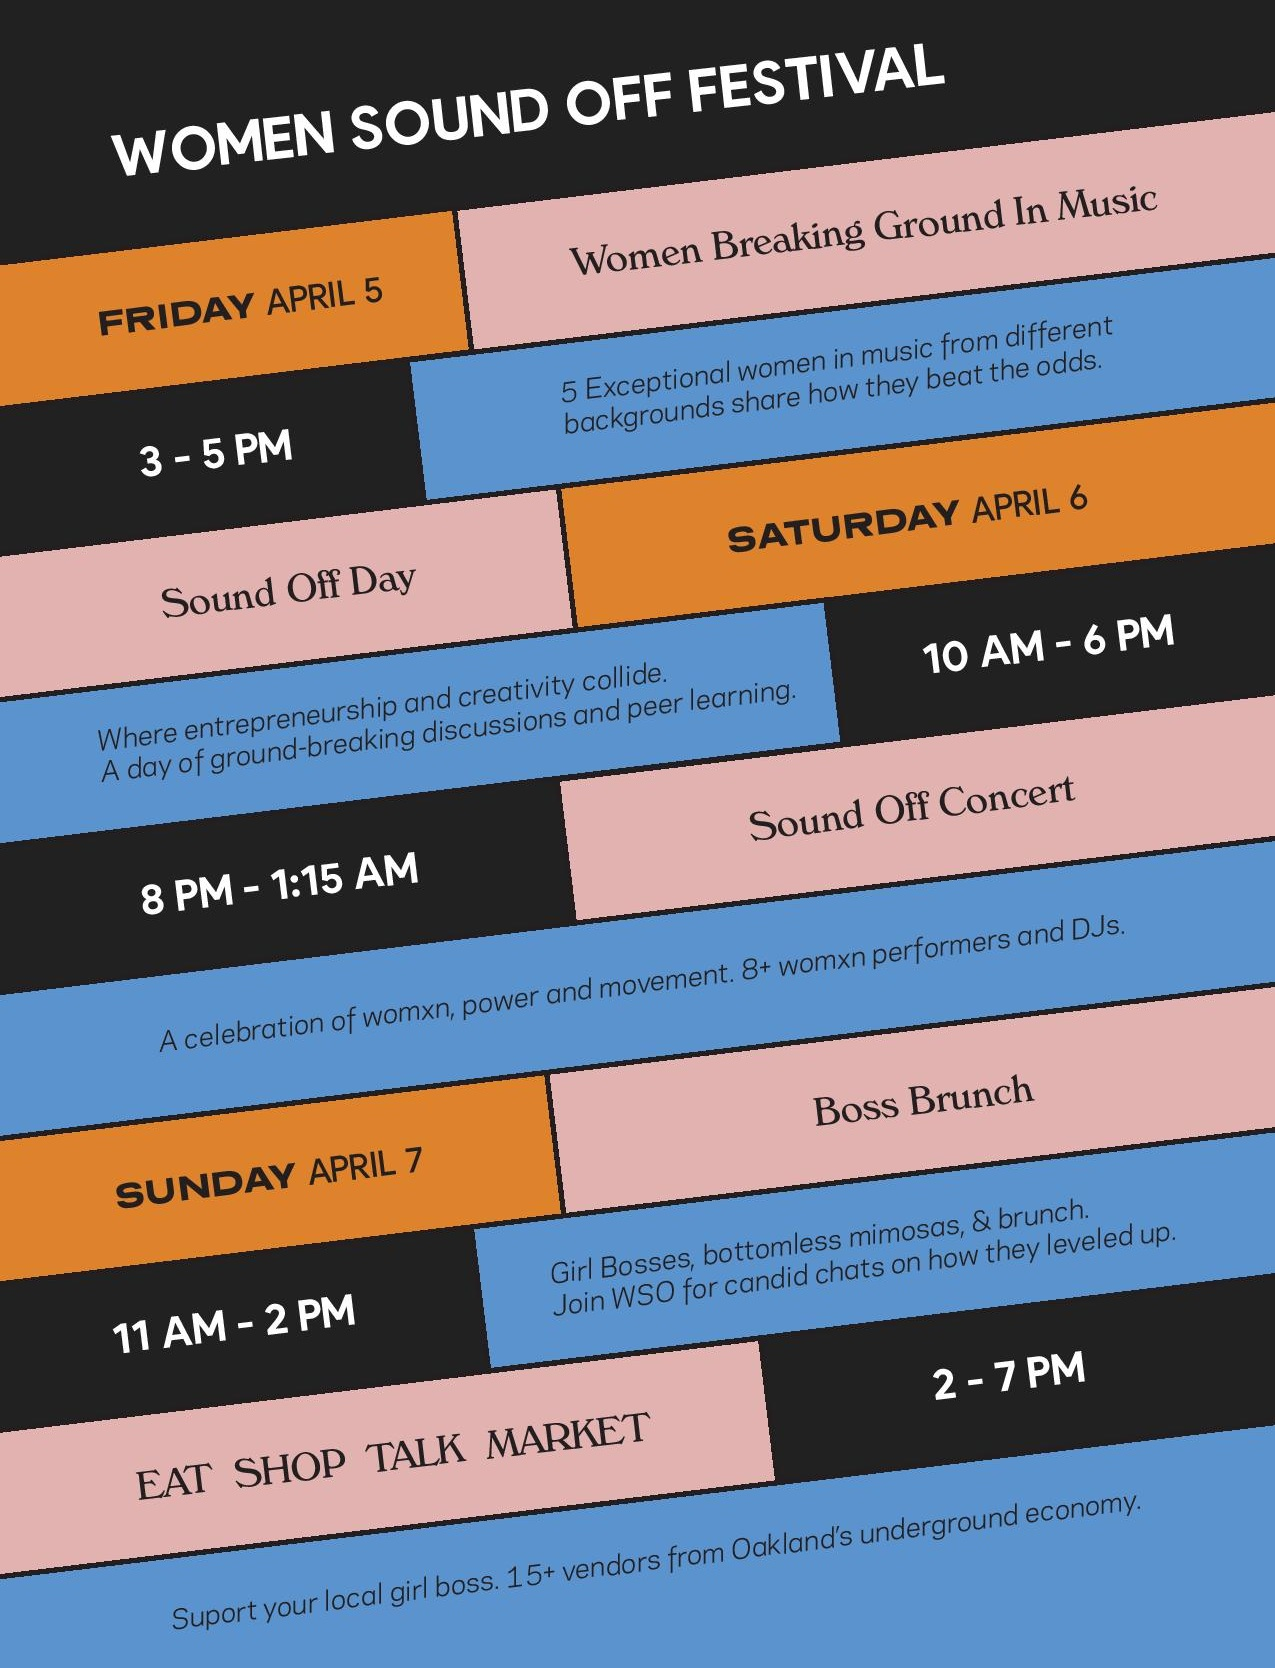 * Weekend Pass excludes 4/5 Women Breaking Ground in Music